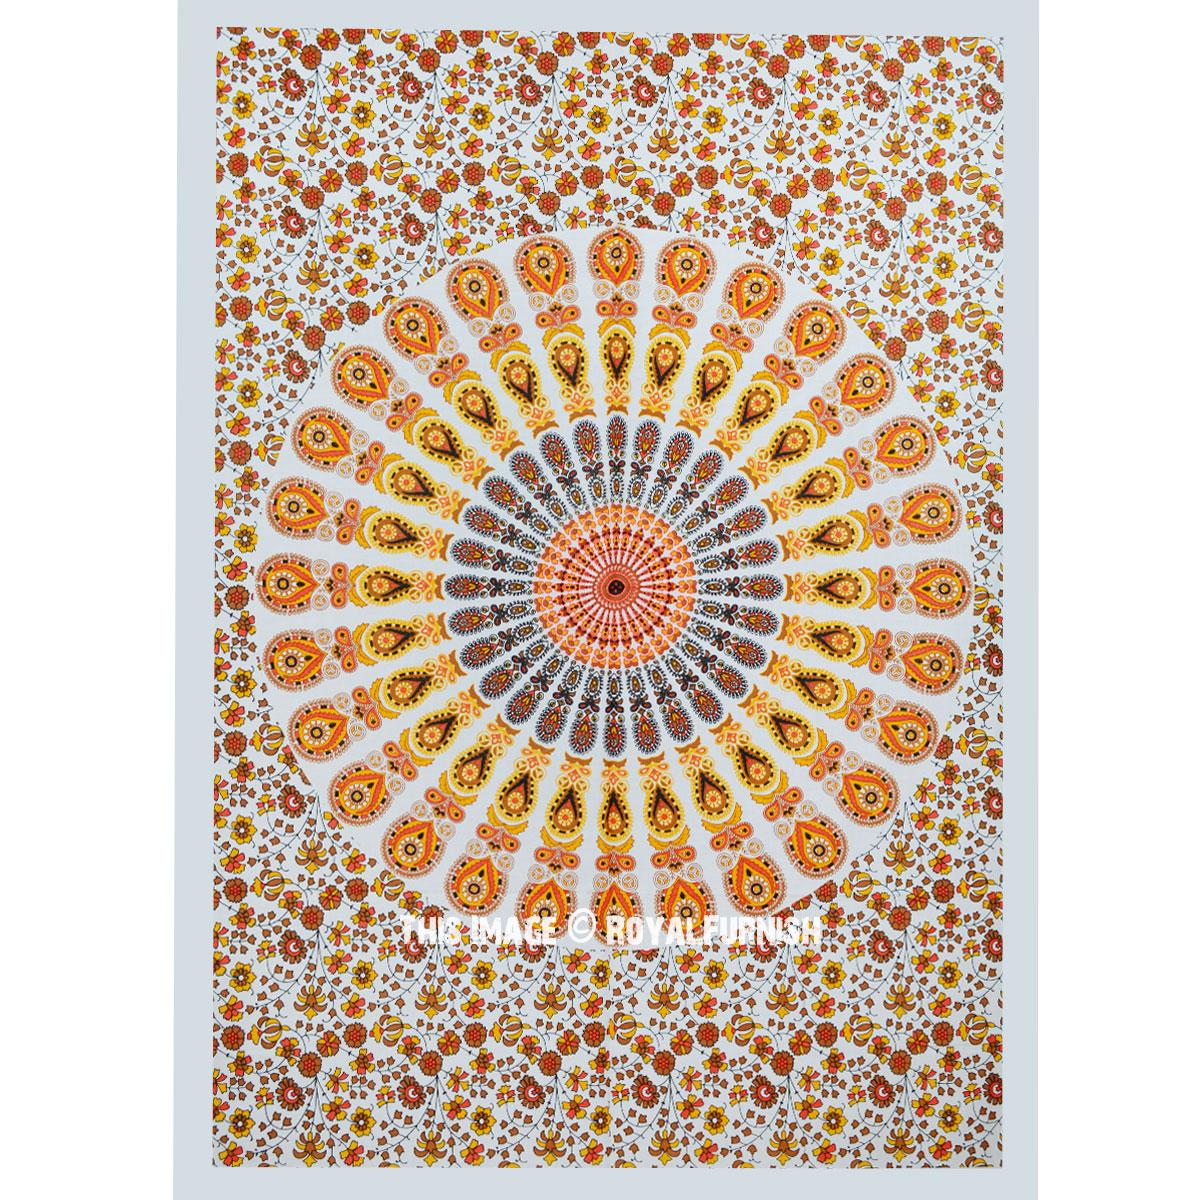 Yellow Colorful Cloth Fabric Mandala Poster Tapestry